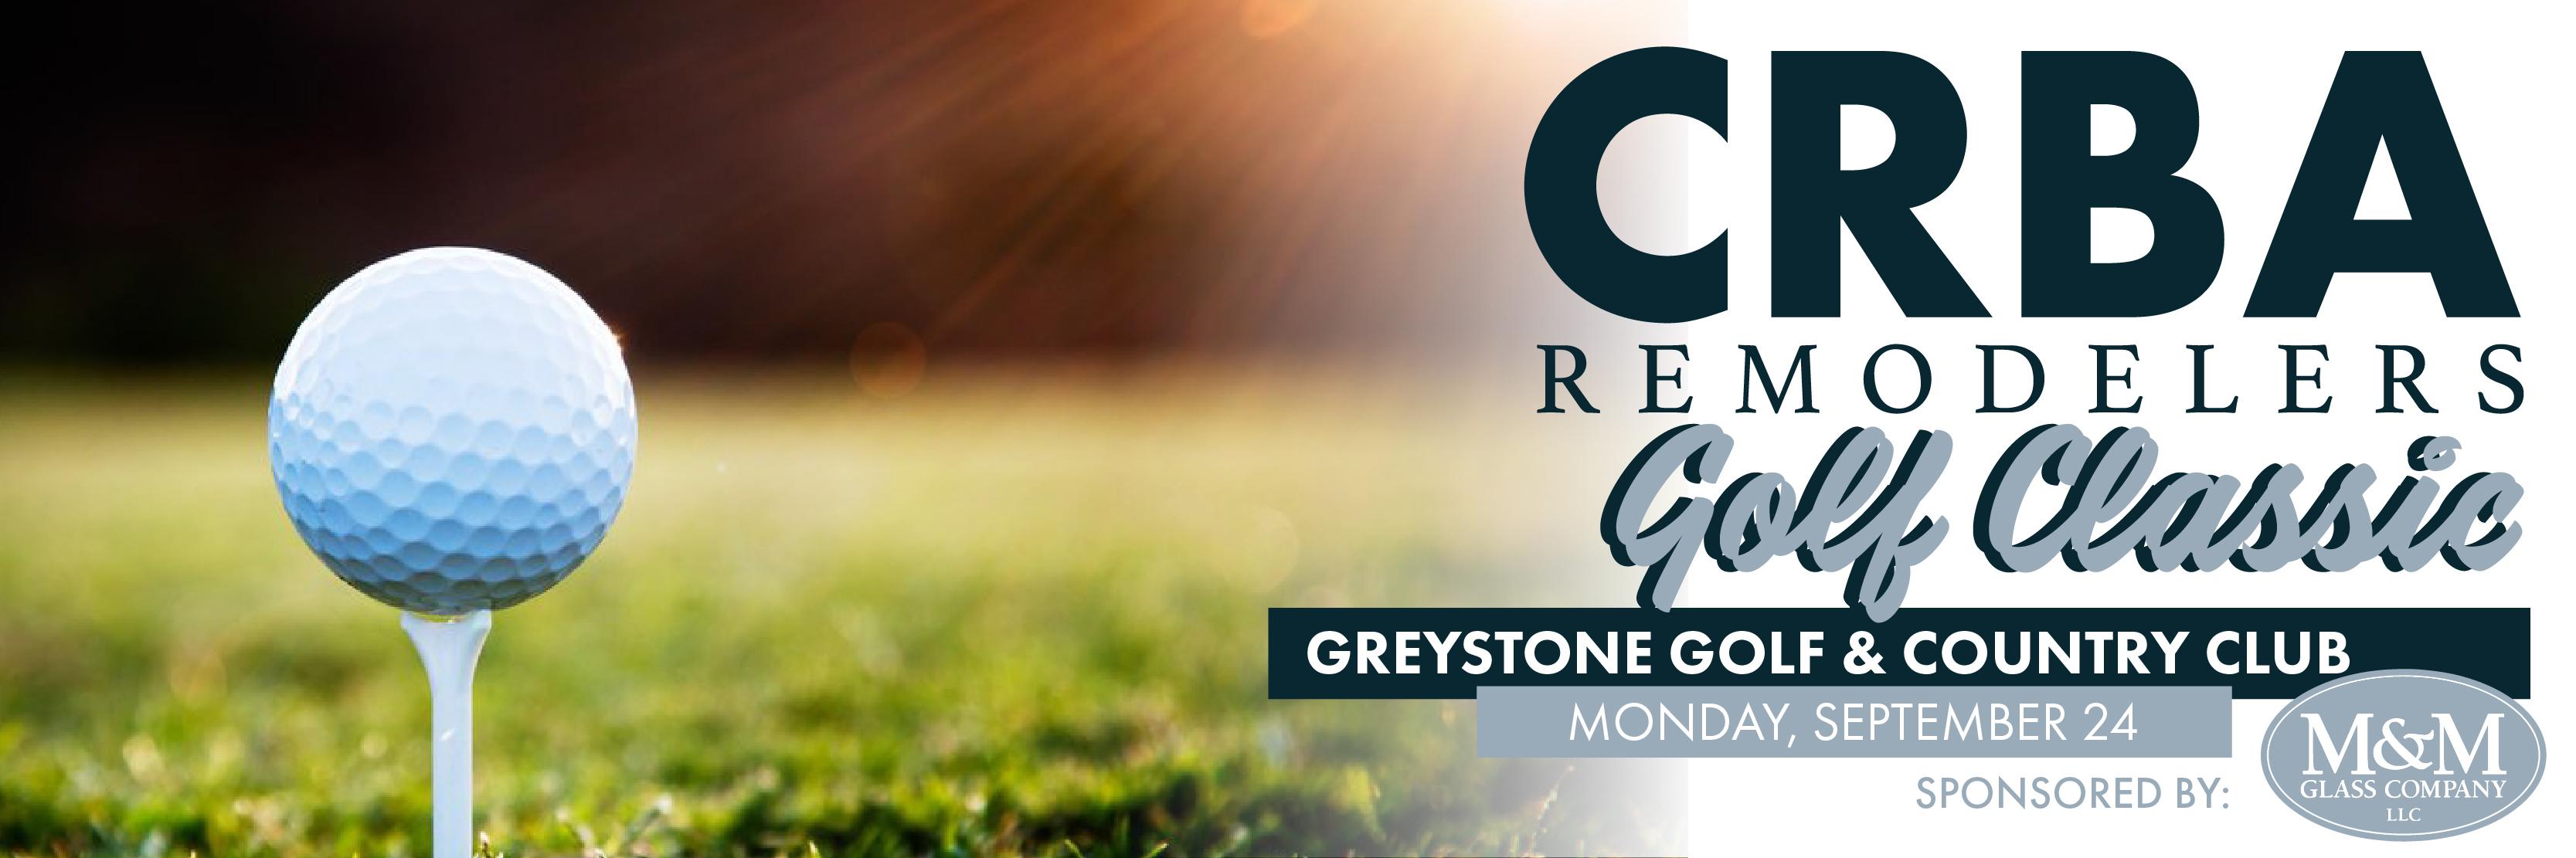 Capital Region Builders Association Remodelers Council Golf Classic